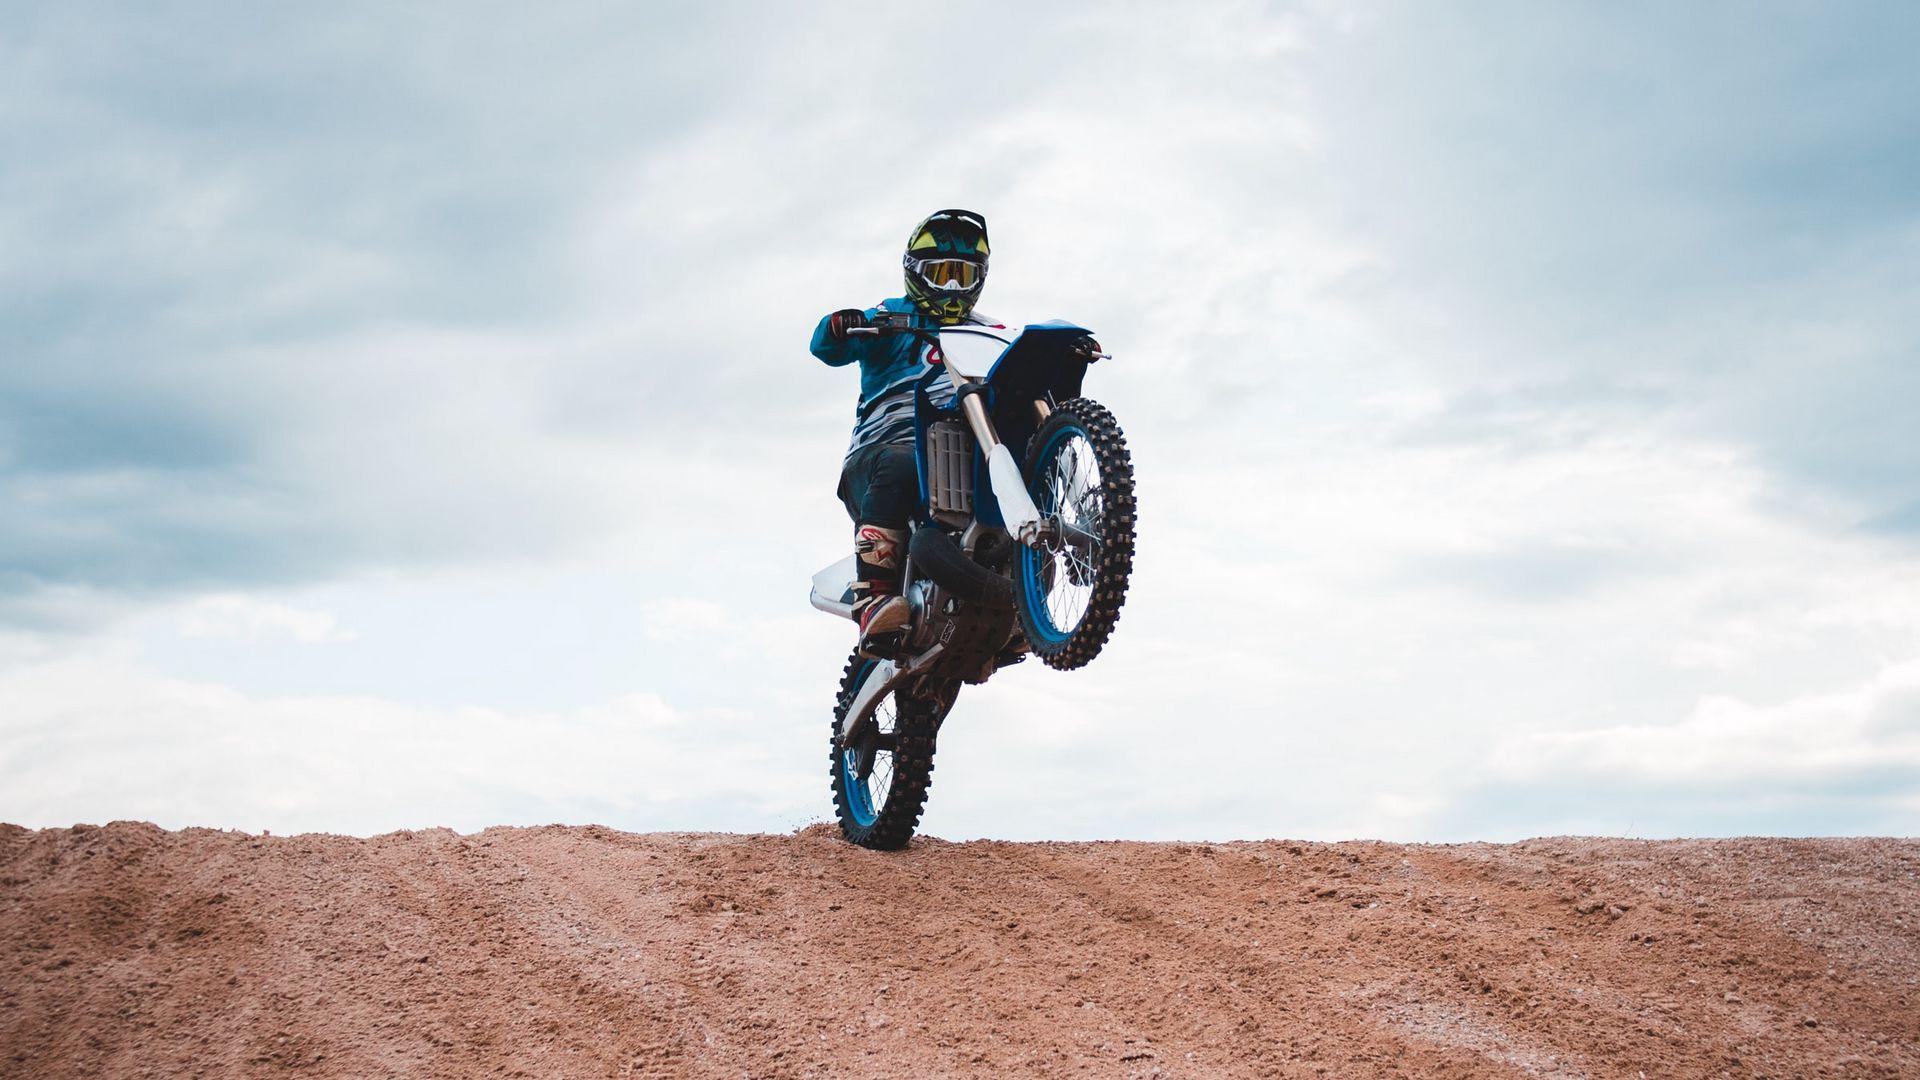 Motorcyclist, Motorcycle, Helmet Download Free HD Wallpapers (7)